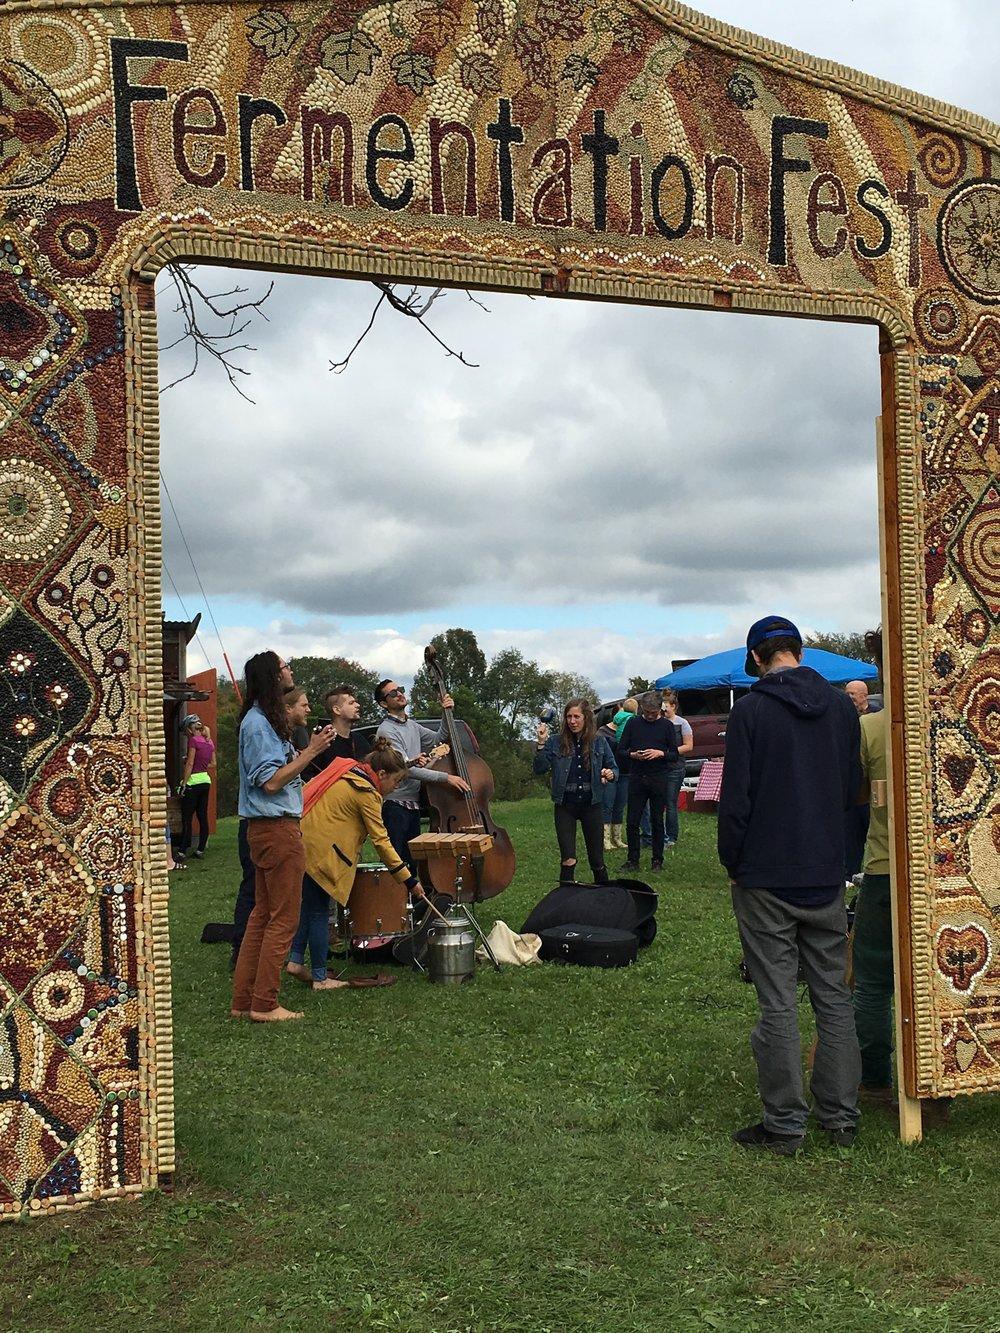 Wormfarm Institute's Fermentation Fest